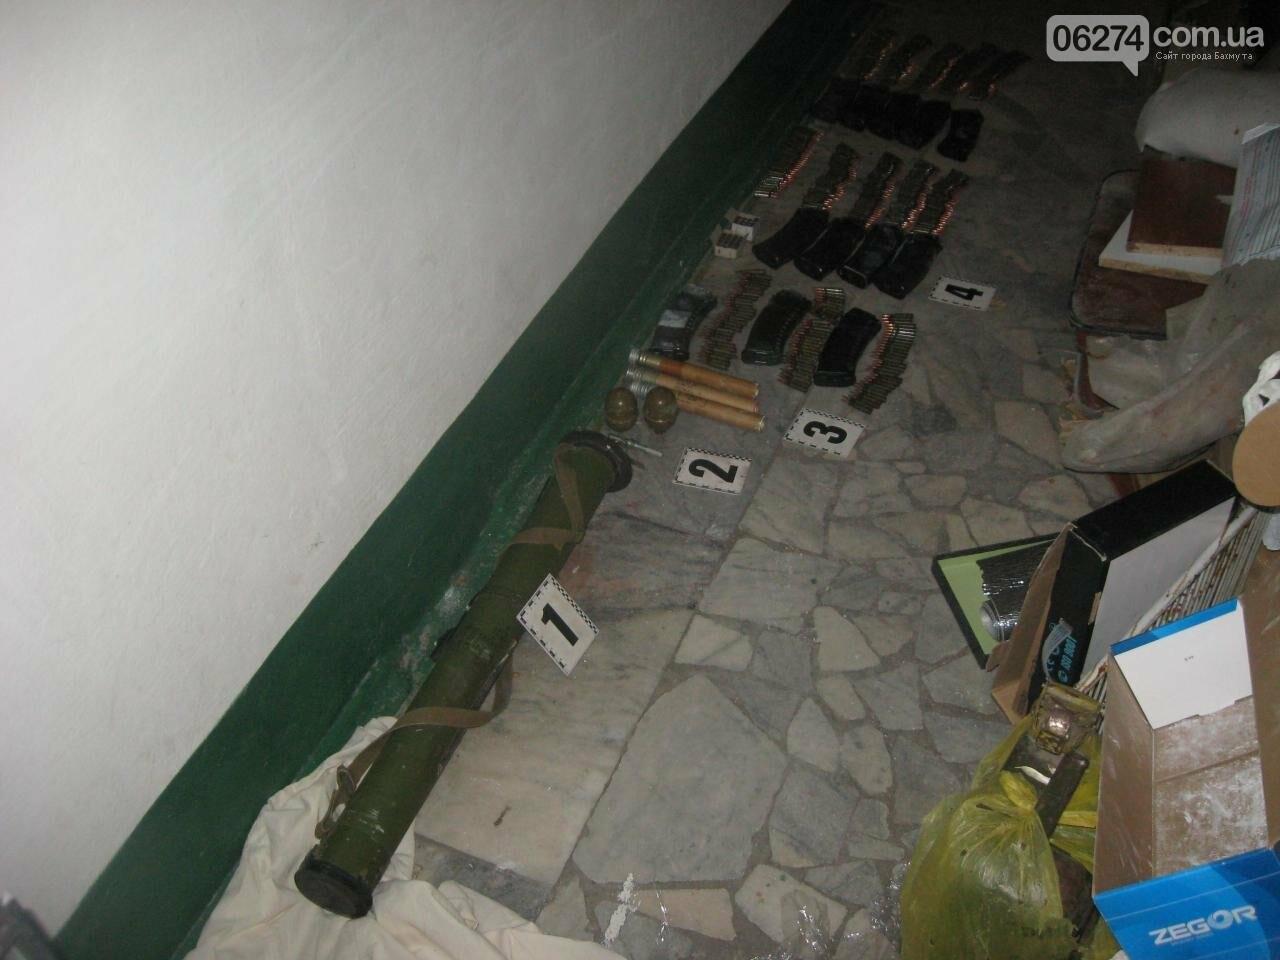 В одной из квартир города бахмутчанин прятал арсенал боеприпасов, фото-3